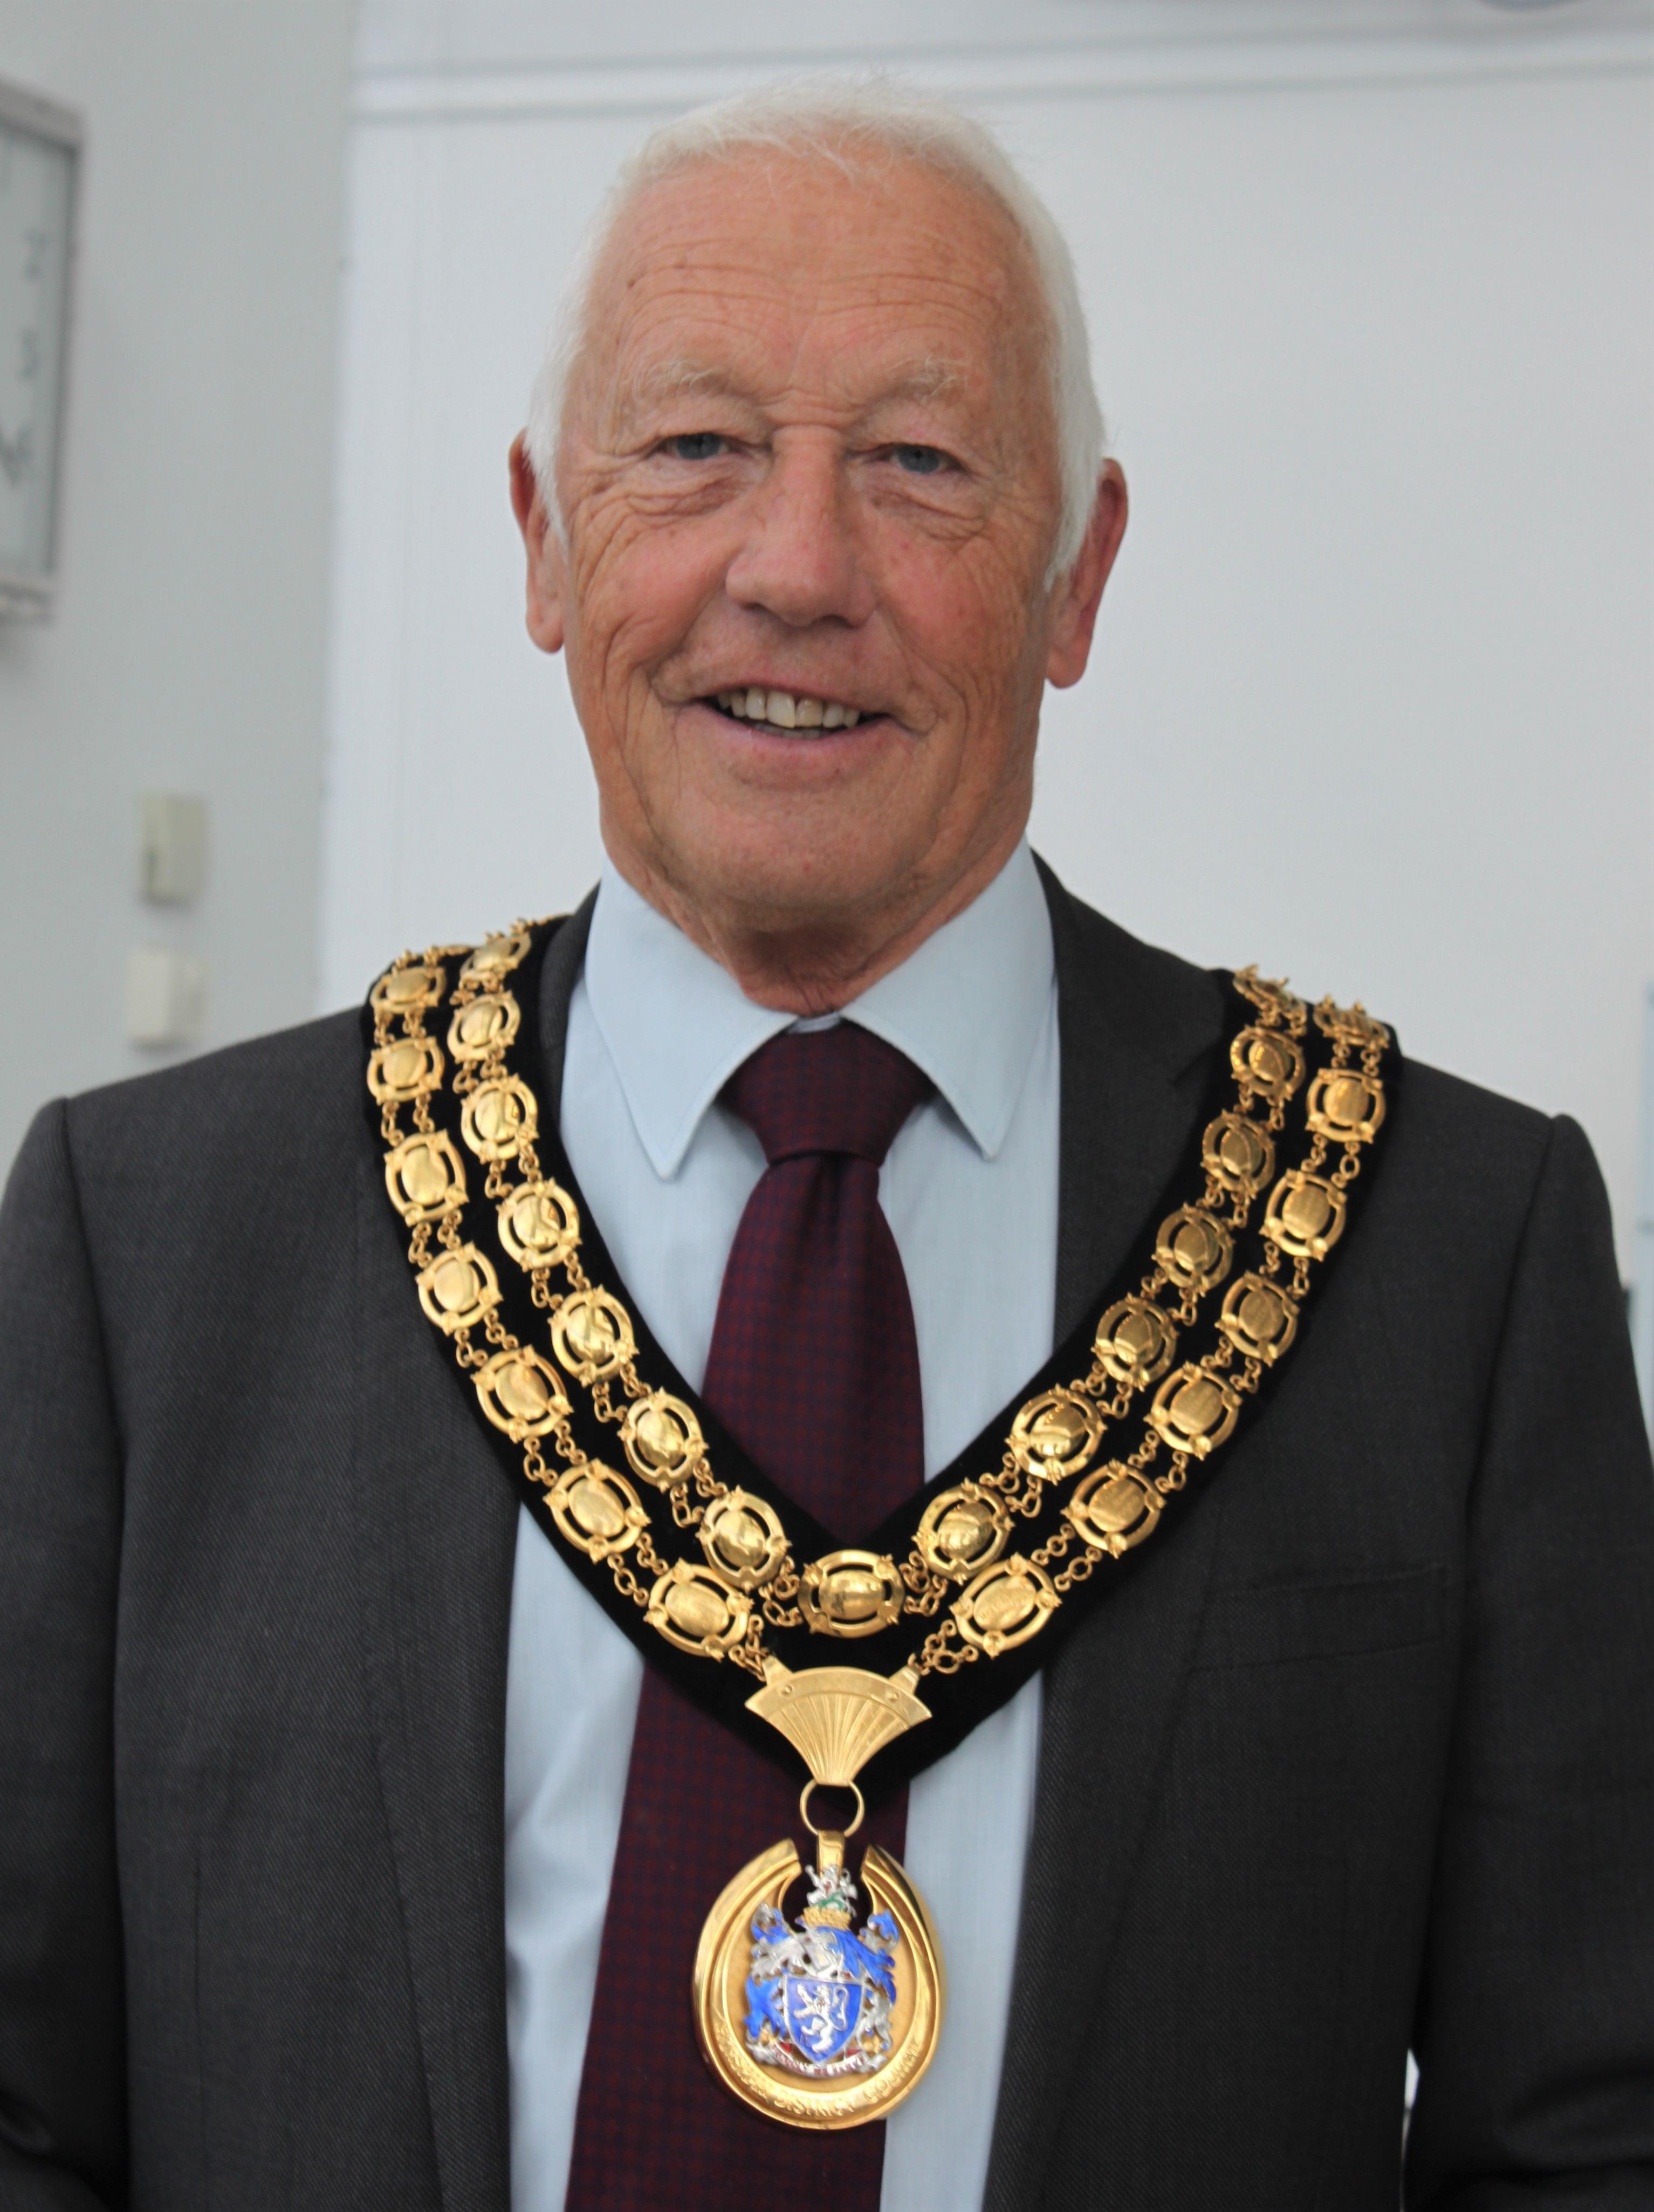 Newly elected Horsham District Council Chairman Cllr David Skipp 26 May